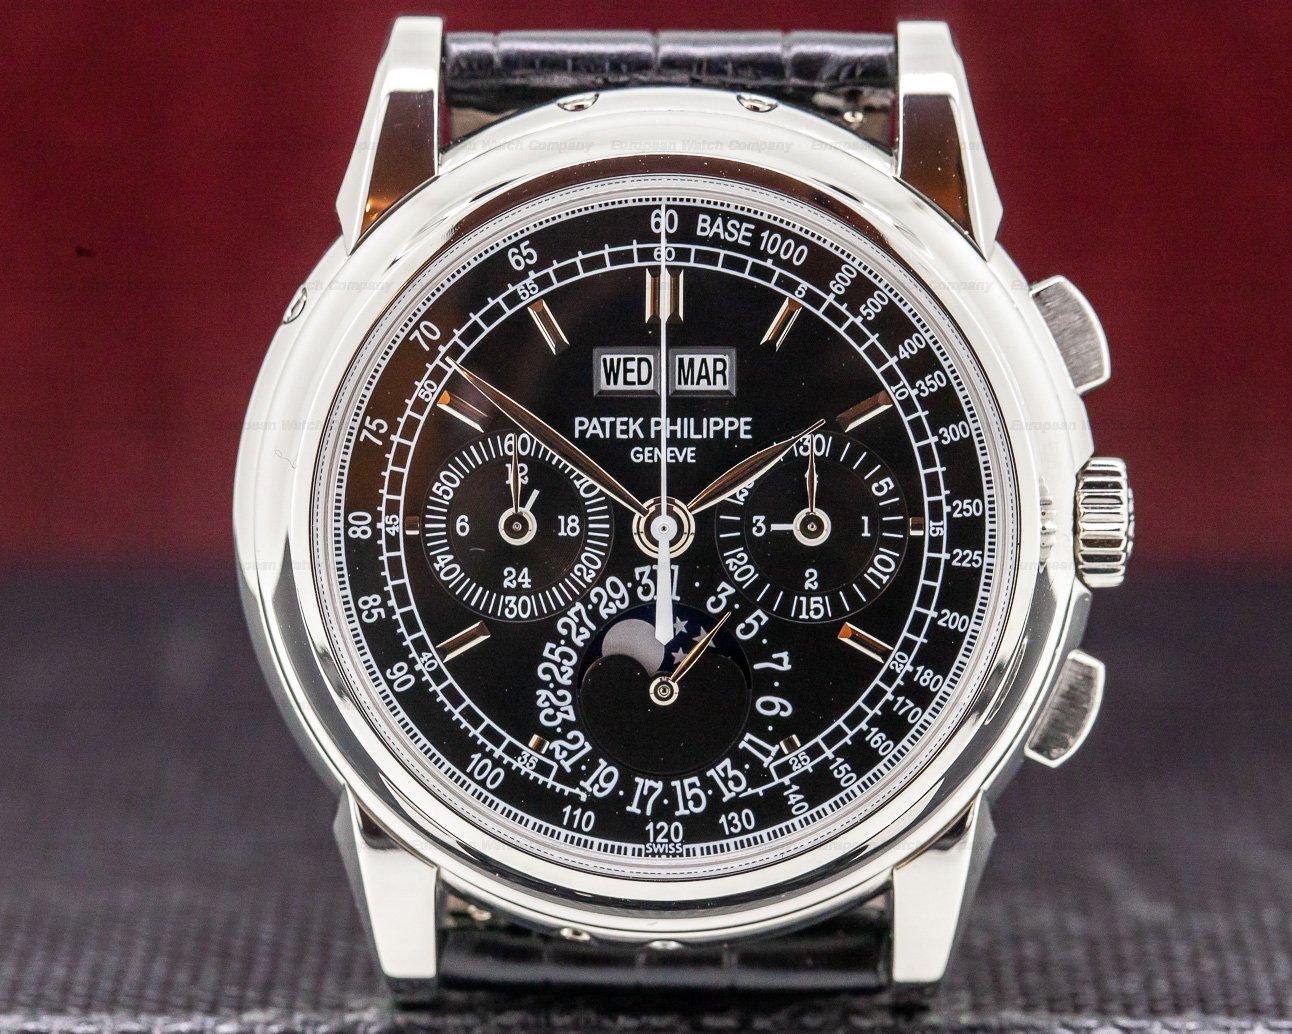 (31329) Patek Philippe 5970P-001 Perpetual Calendar Chronograph Platinum FU